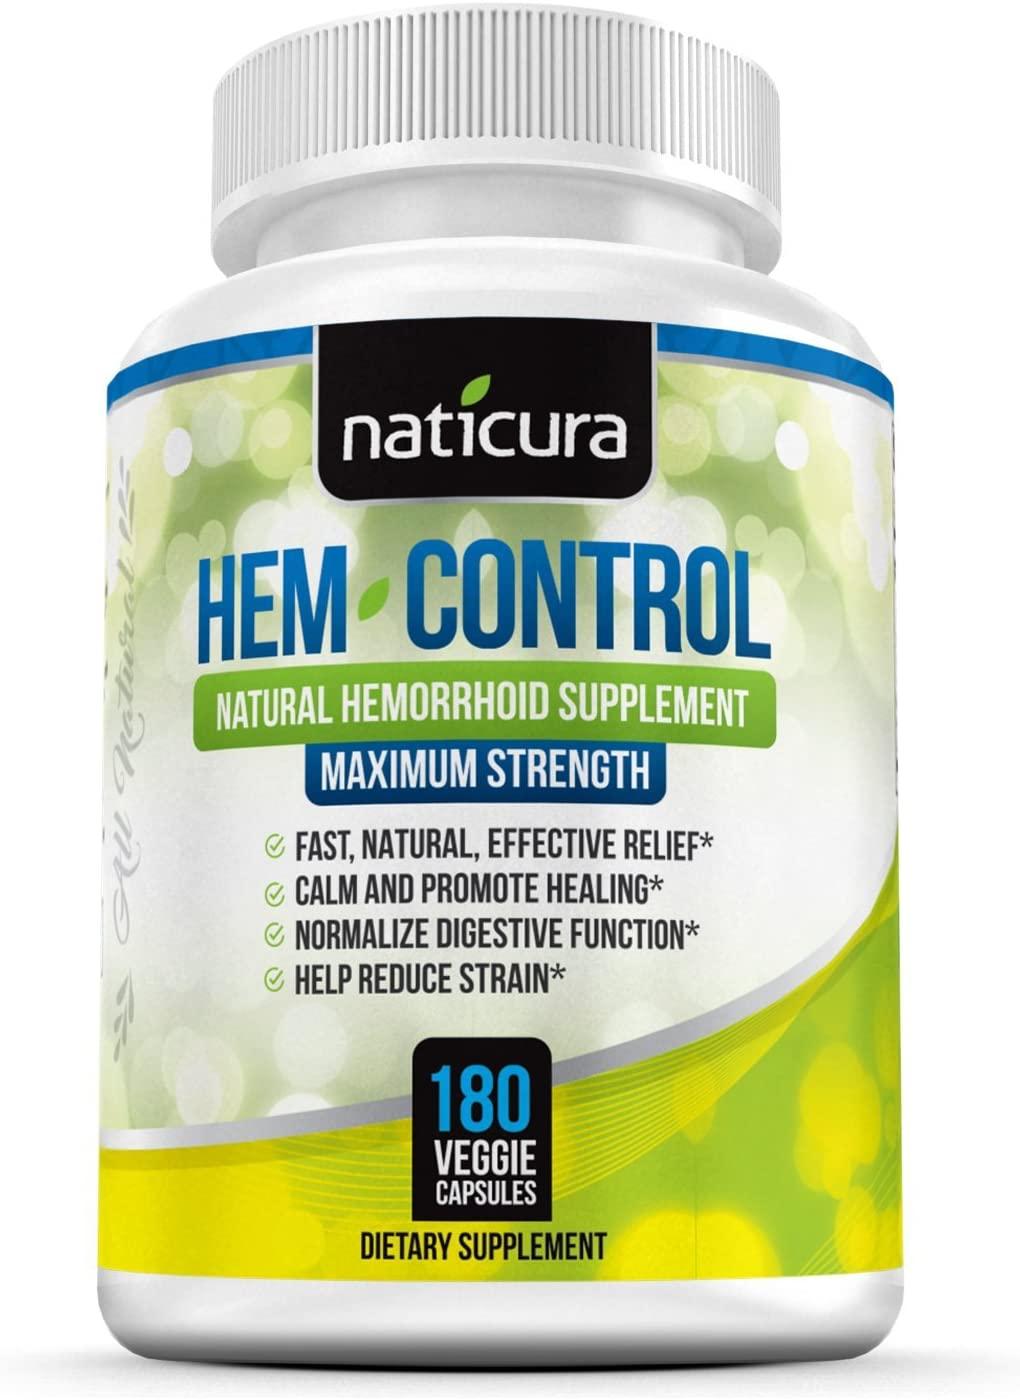 Hem-Control Natural Hemorrhoid Treatment Supplement - Fast & Lasting Pain Relief Pills - Vegan Capsules for Hemroid & Colon Health with Blond Psyllium Husk (180)